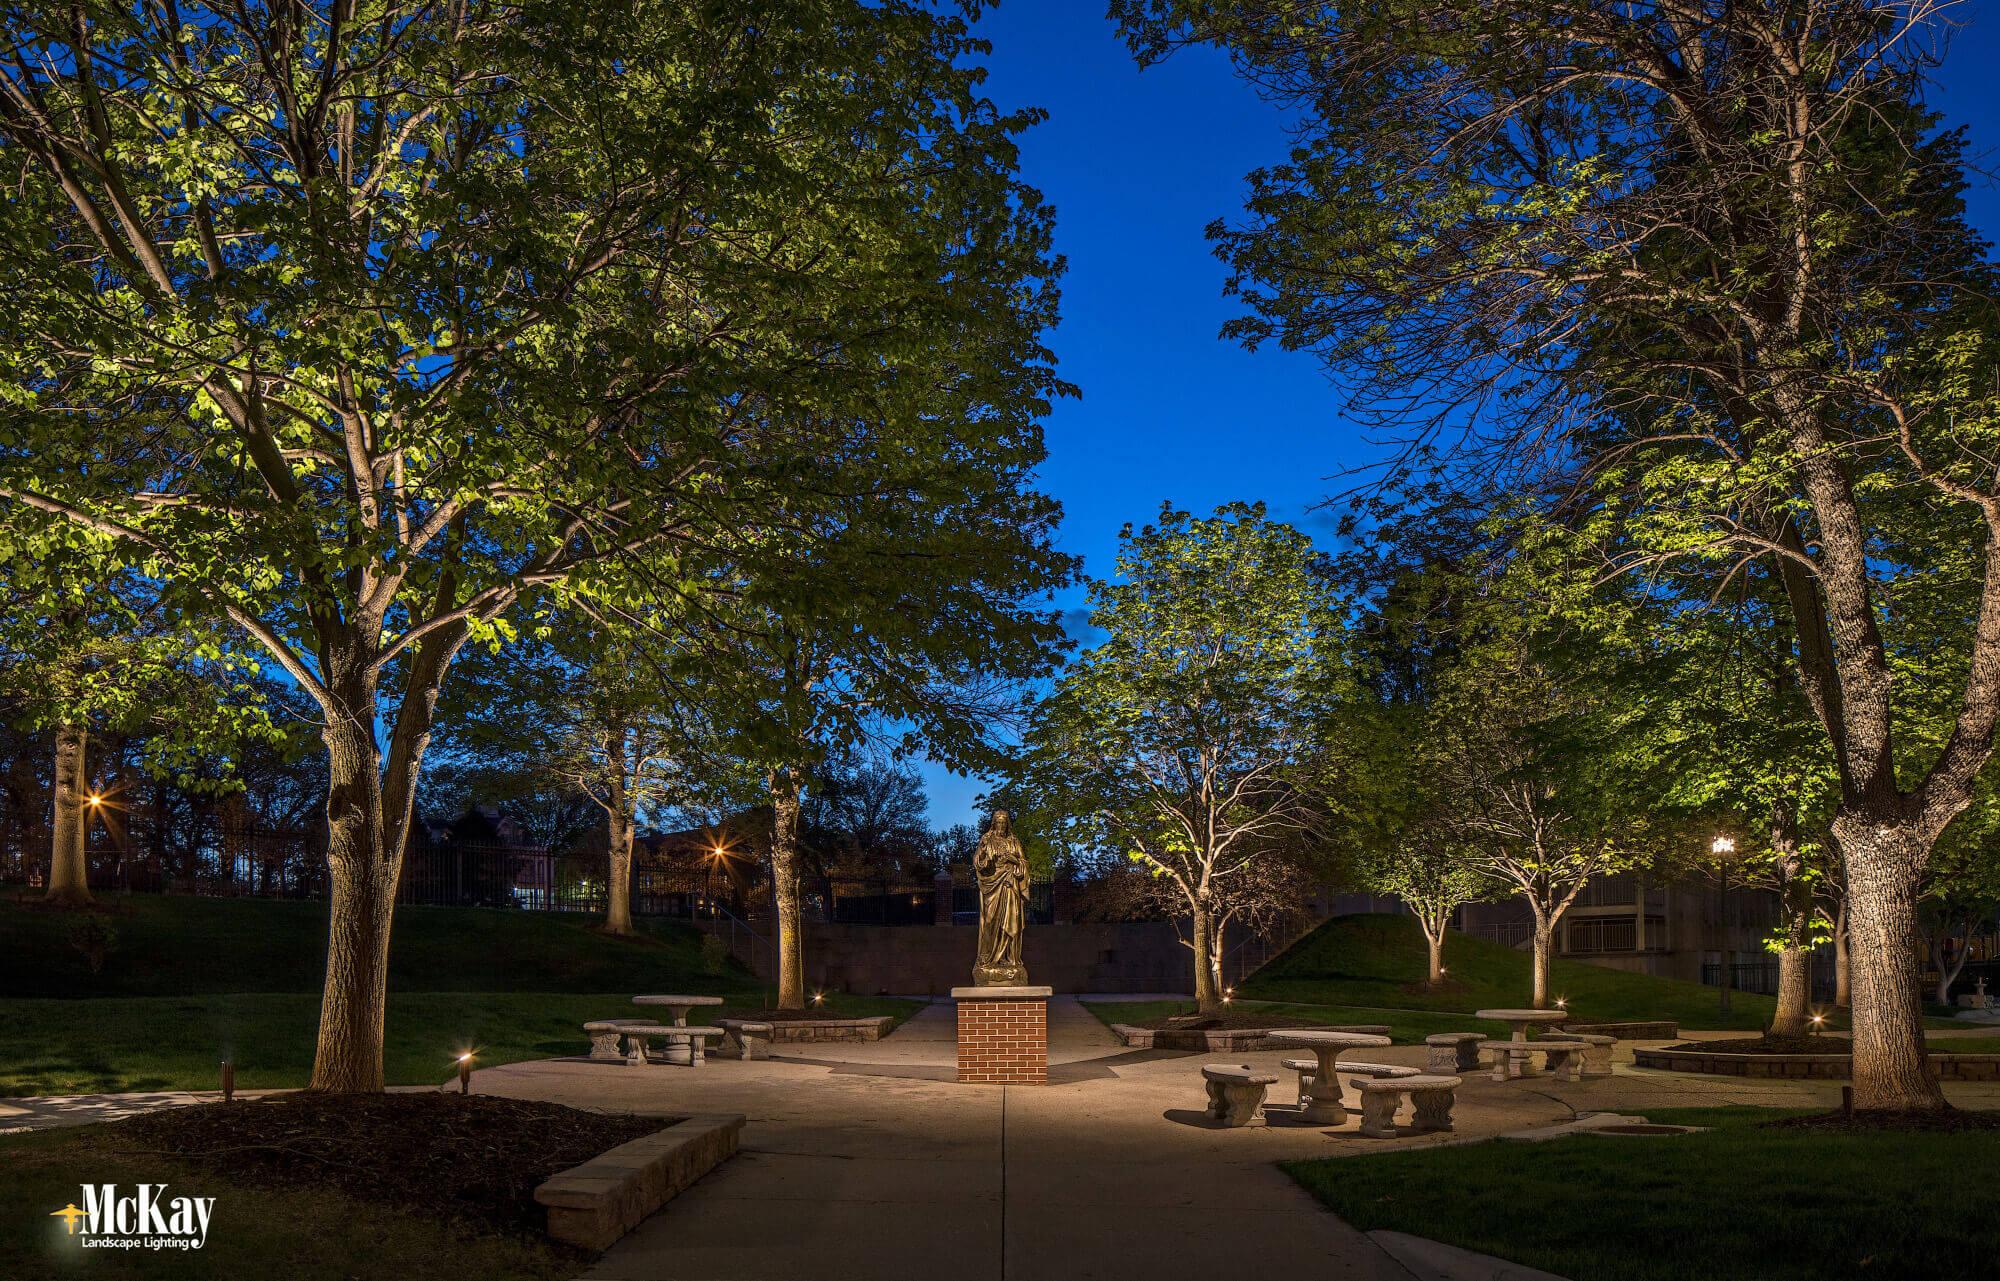 Education Facility Exterior Lighting - Landscape Lighting Schools & University Campus